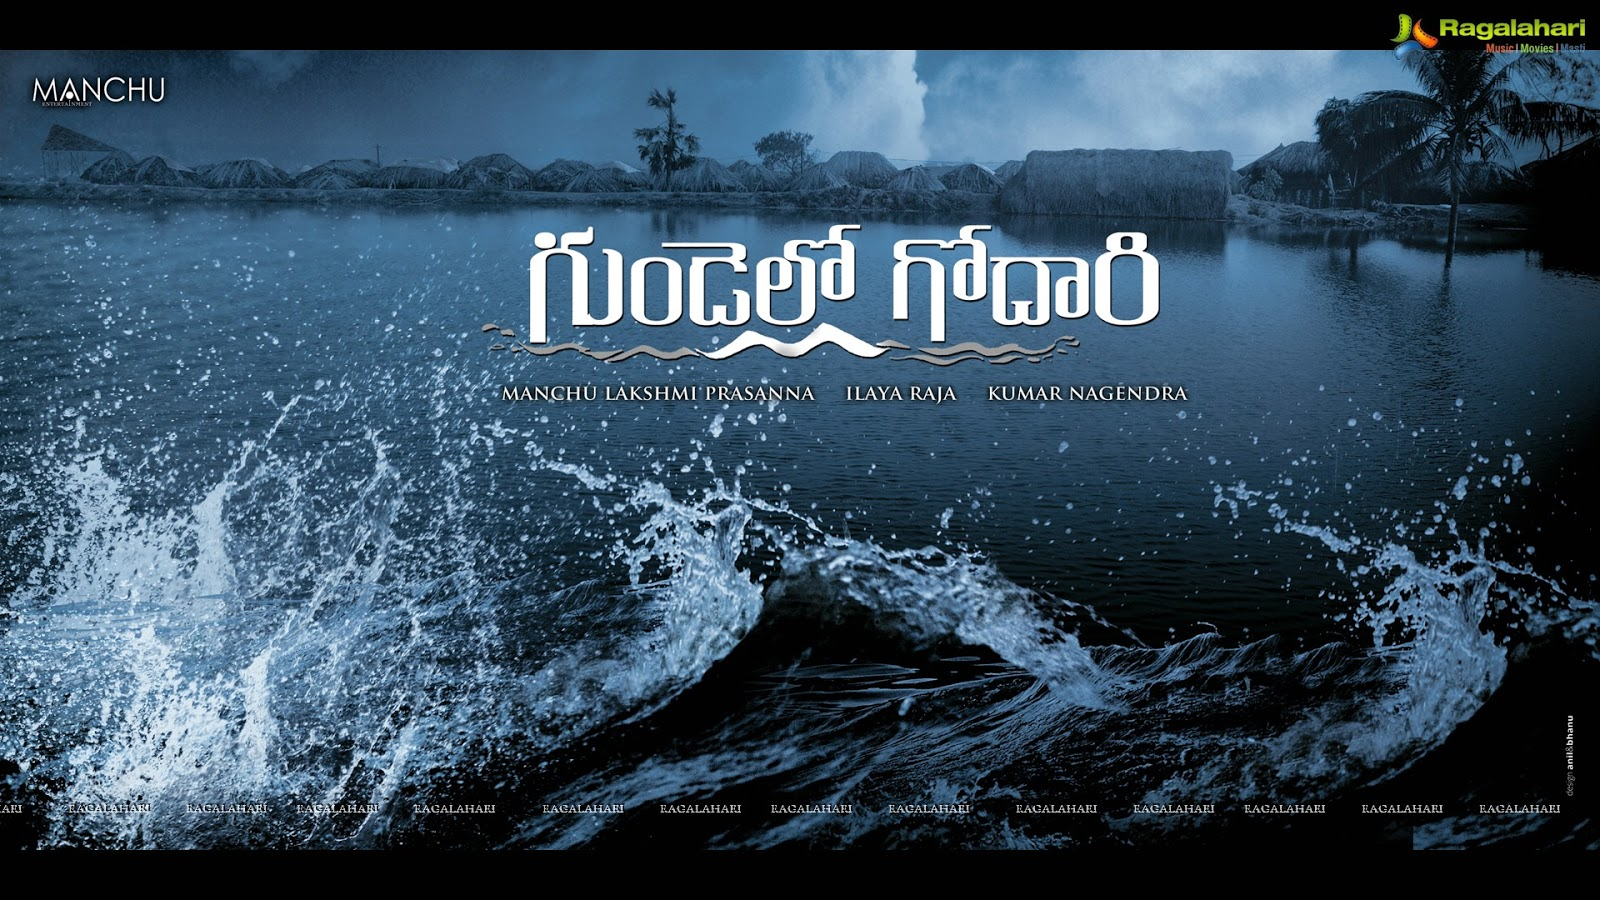 Abcd Hindi Movie Online Youku